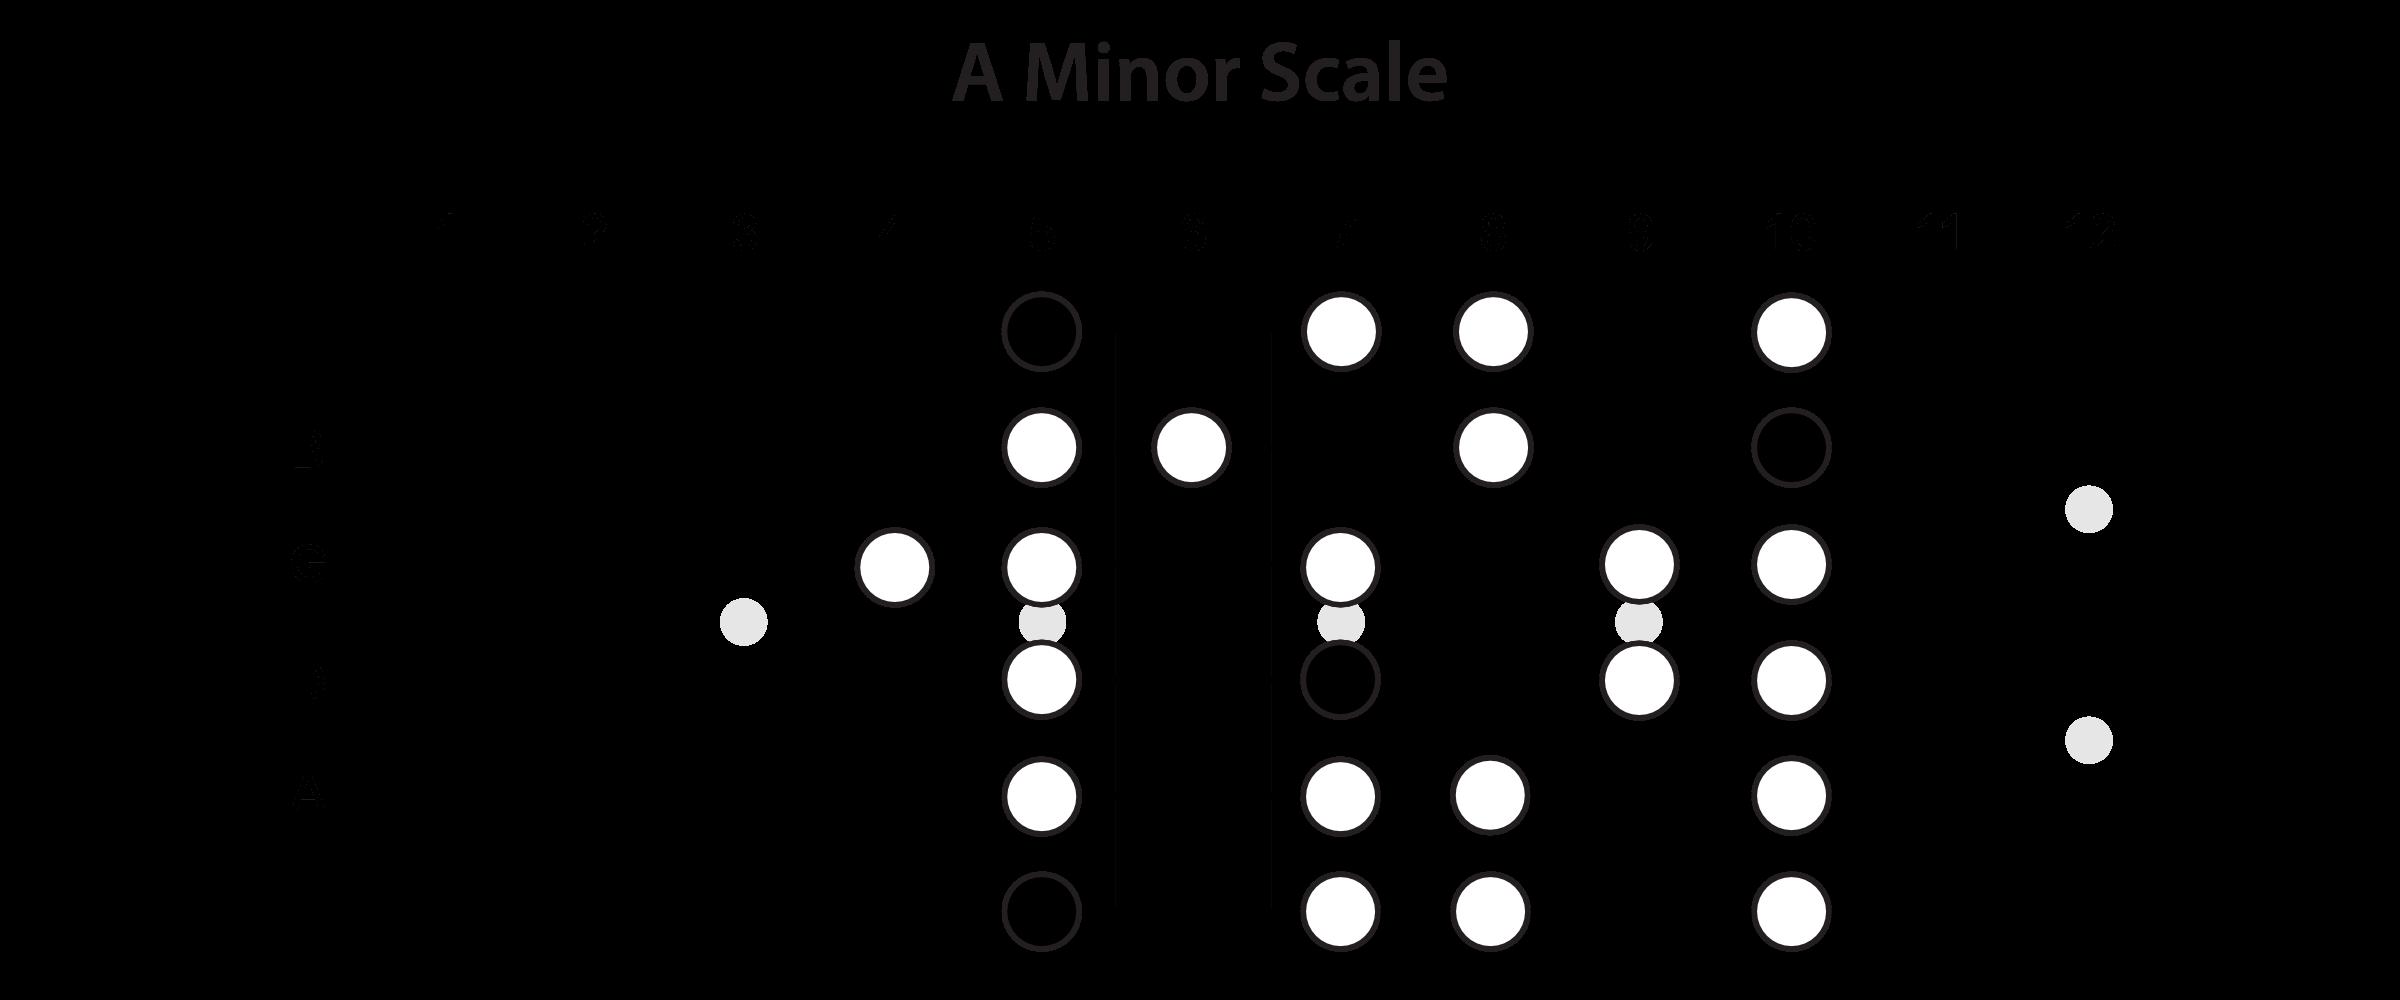 Minor Scale Horizontal View